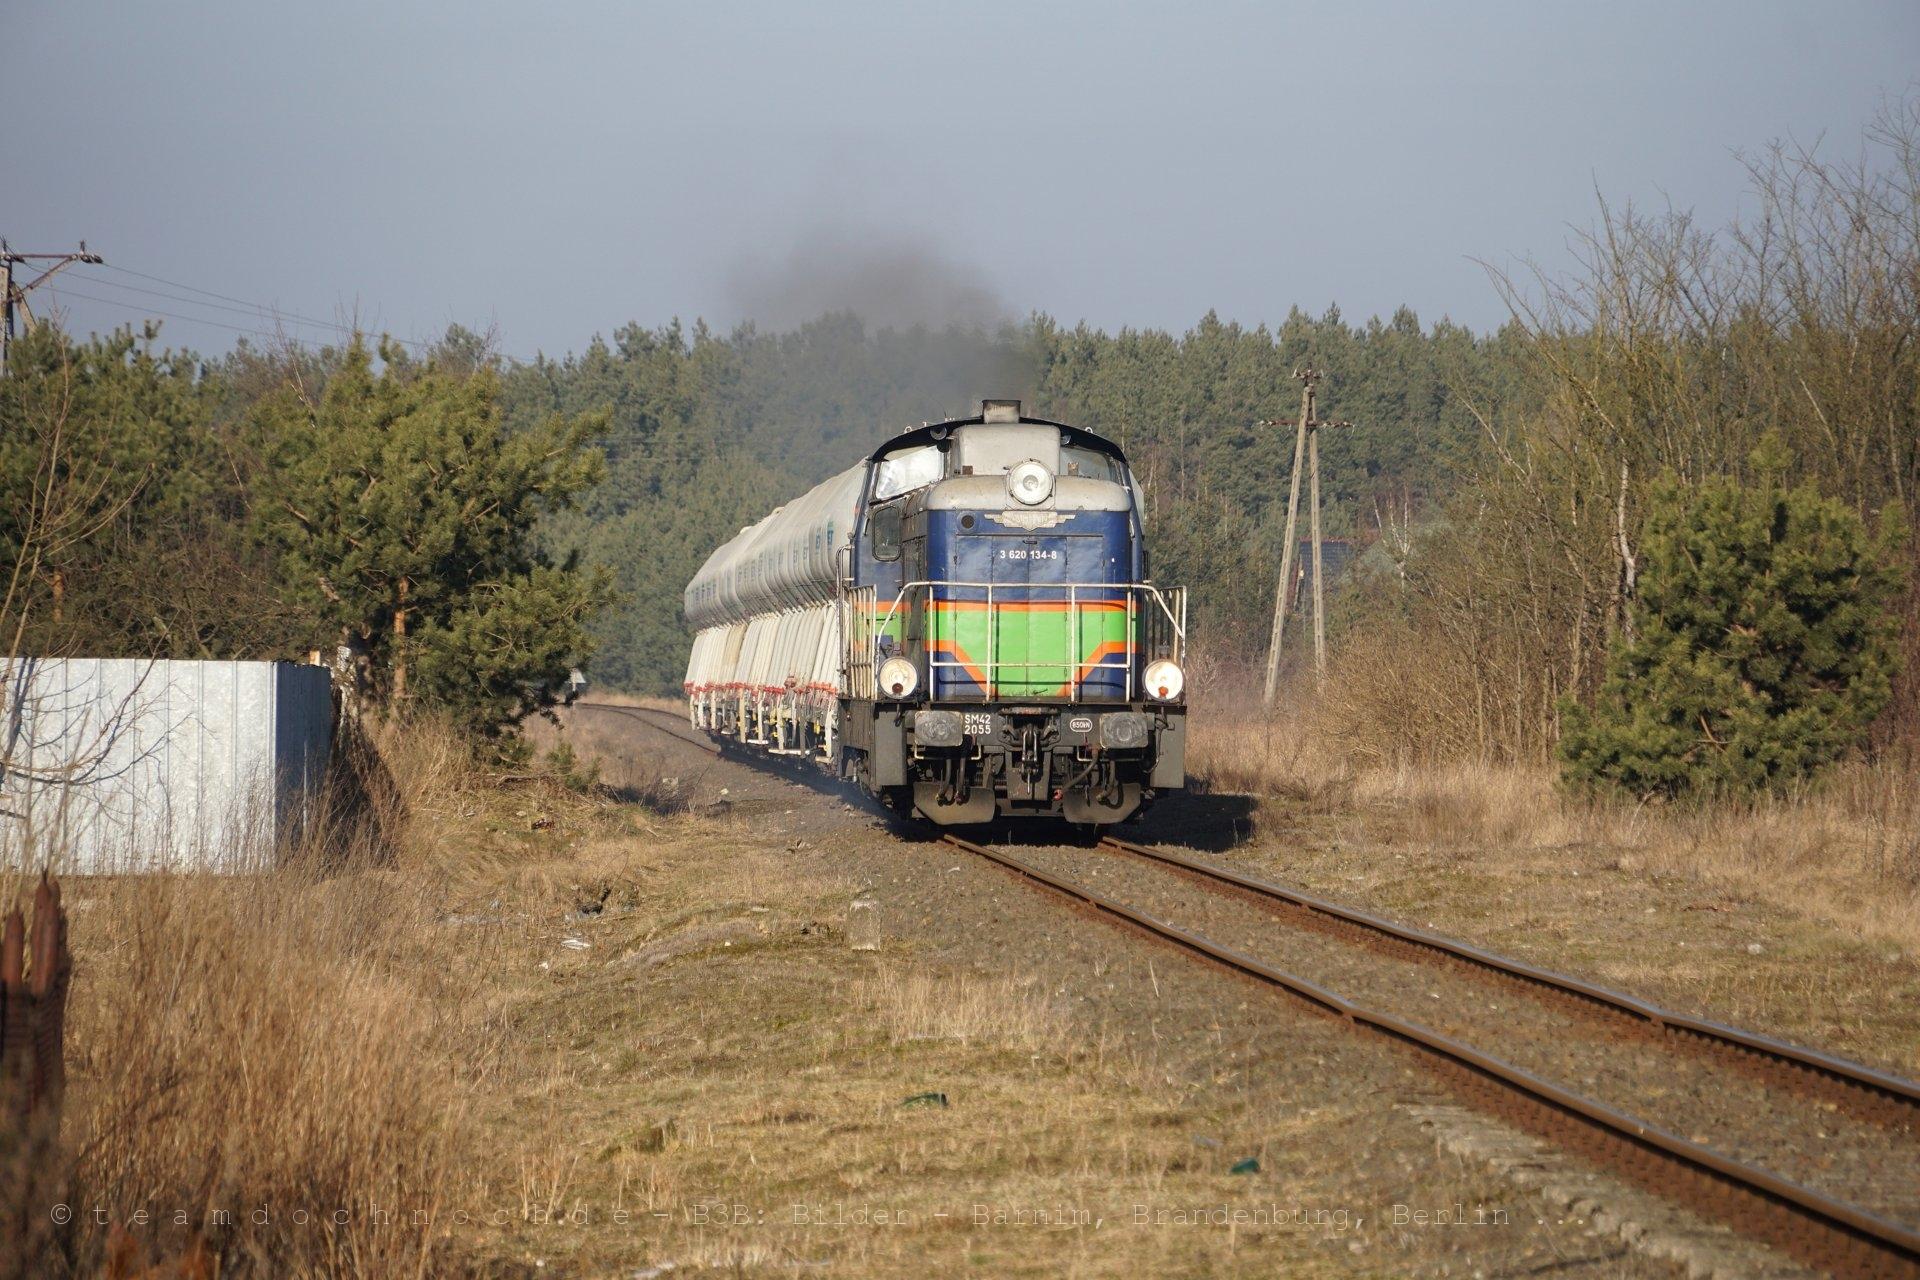 SM42 2055 in Motylewo